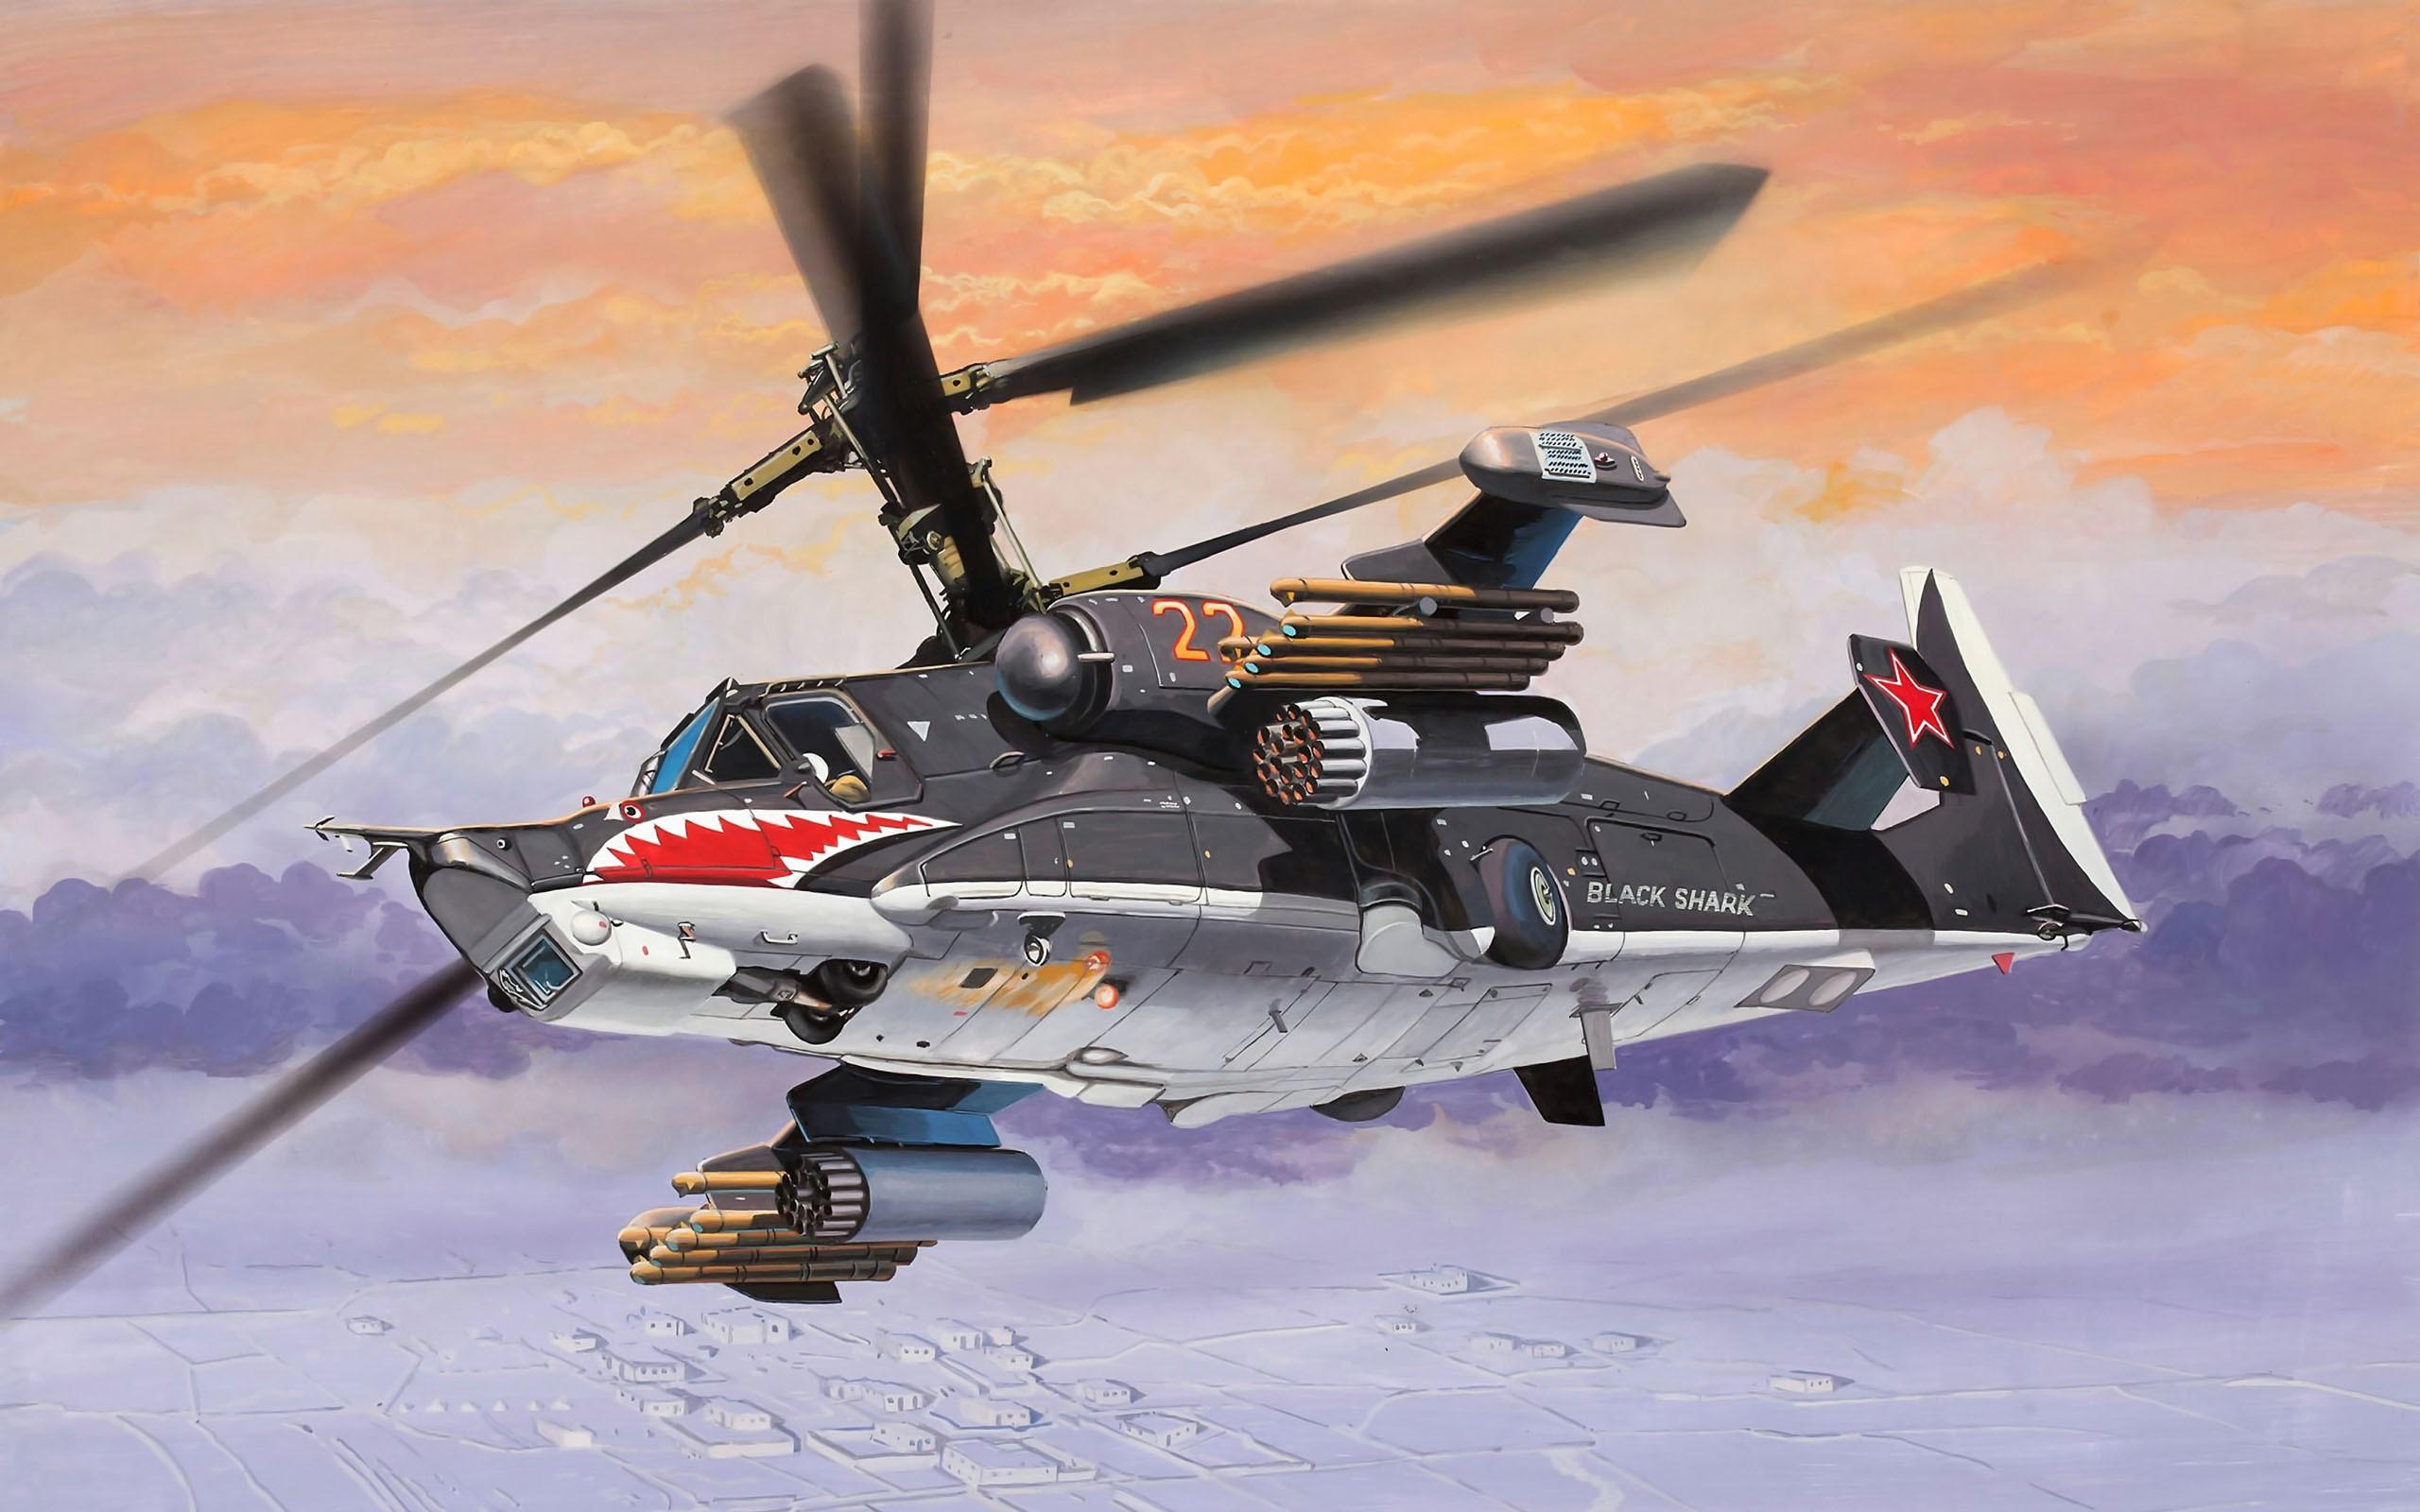 Dibujo de helicóptero - 2560x1600